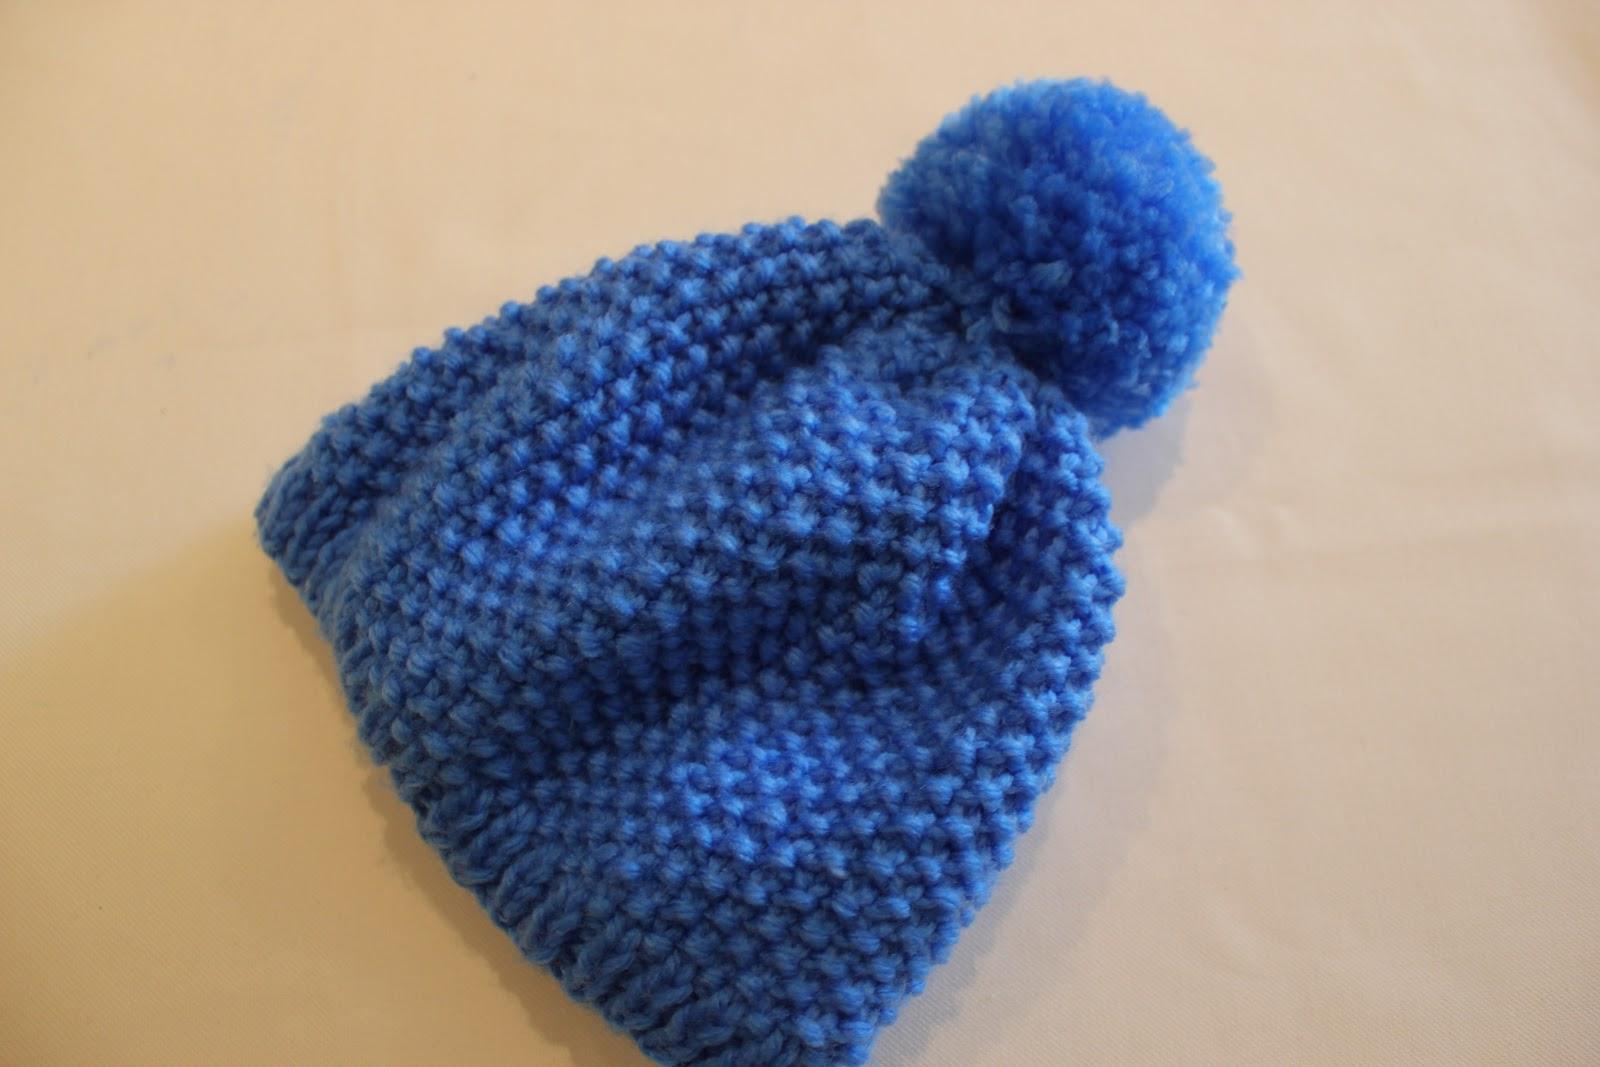 Como hacer gorros de lana imagui for Imagenes de gorros de lana